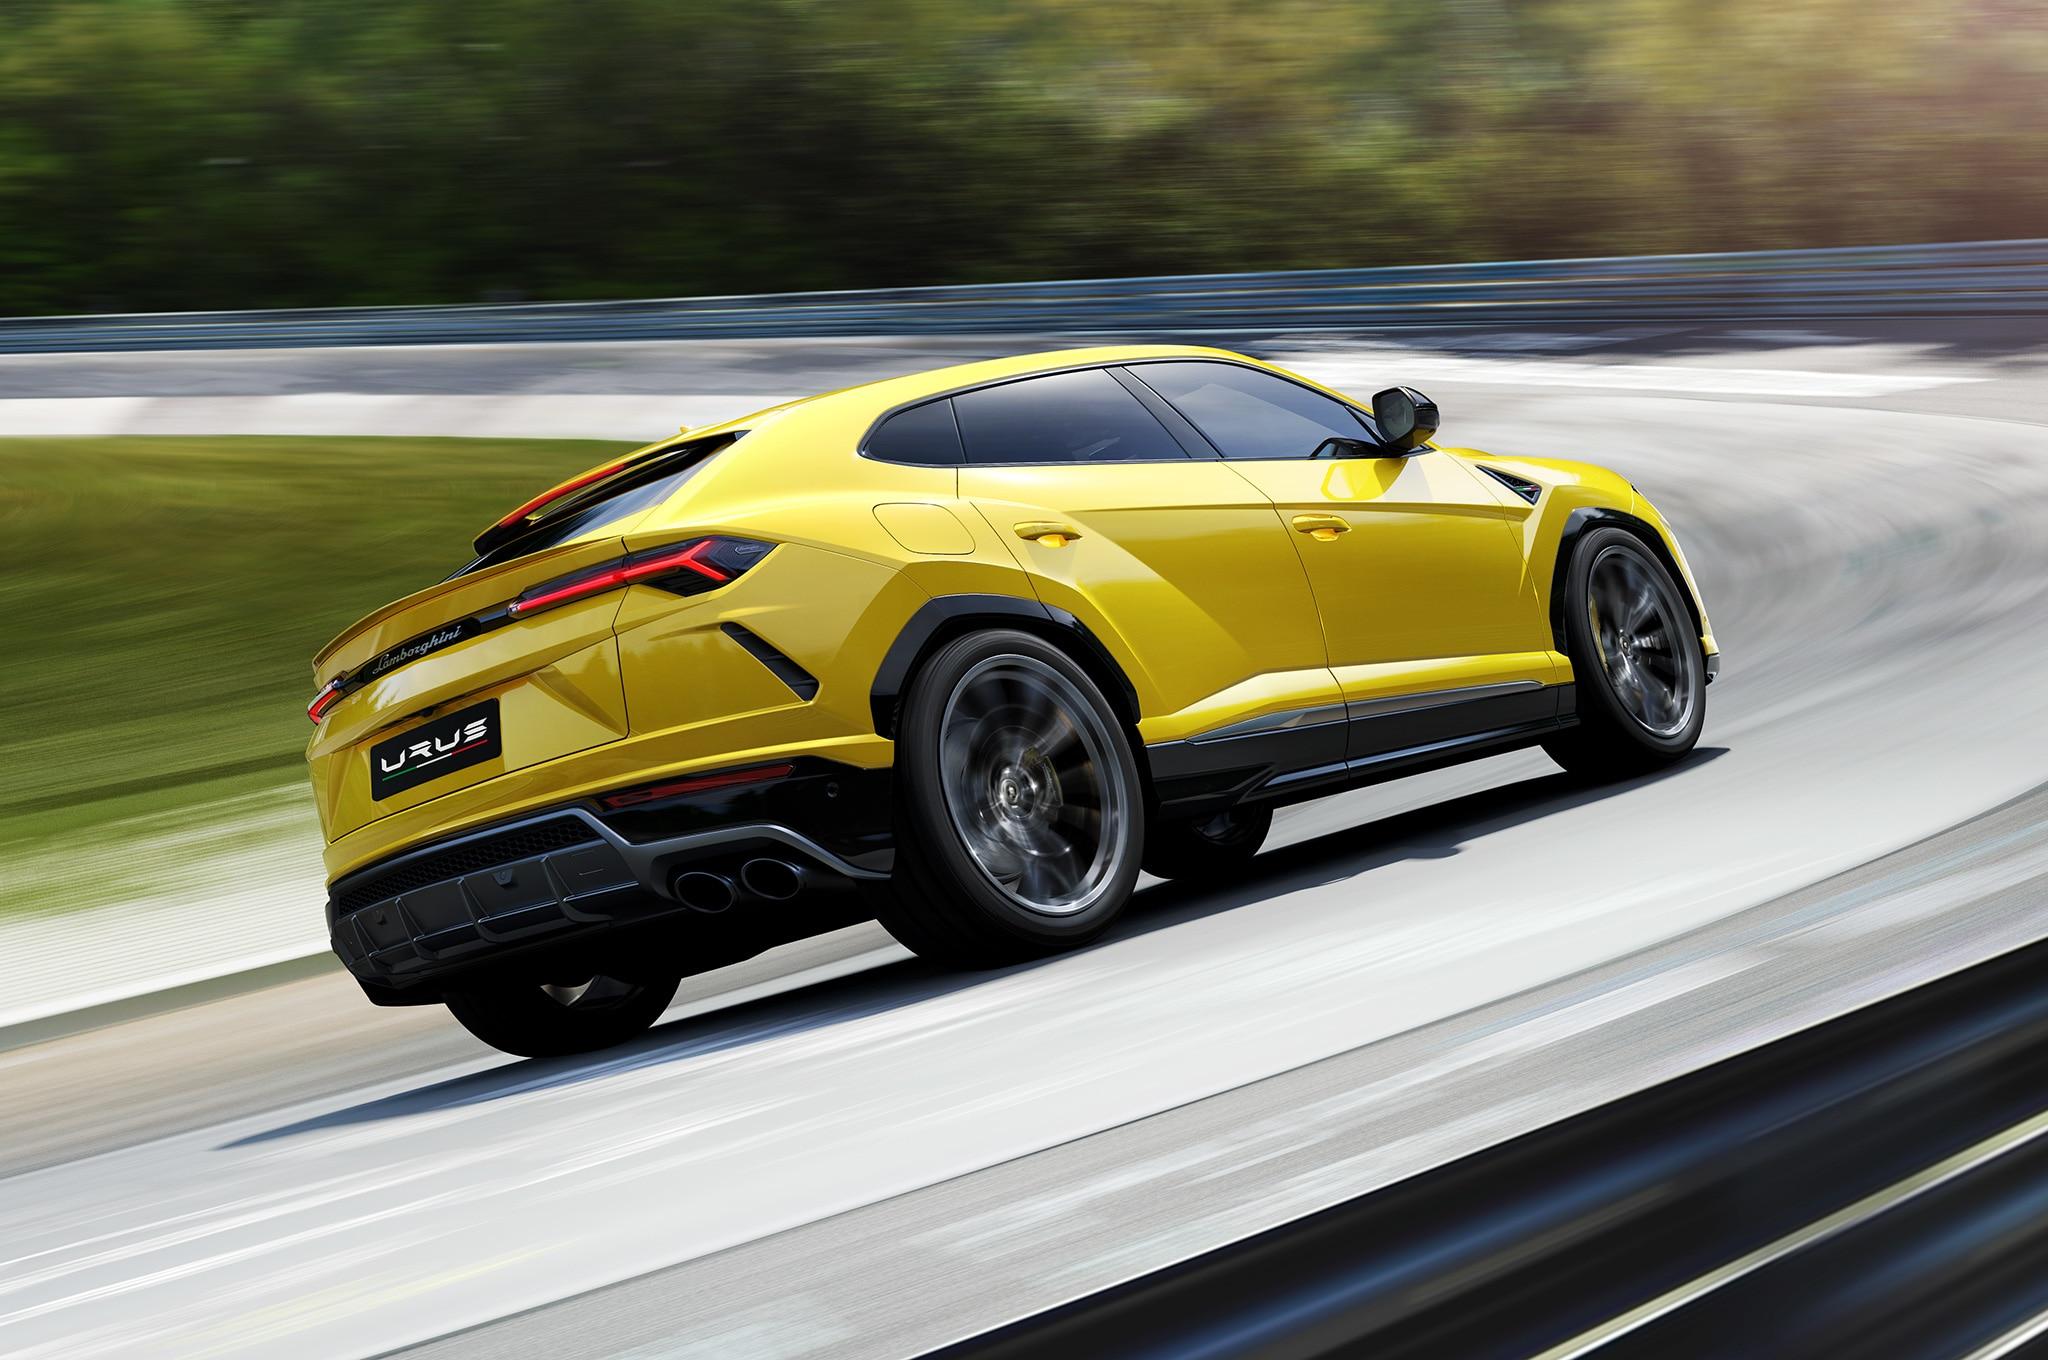 2019-Lamborghini-Urus-rear-side-motion-view-on-Nurburgring.jpg